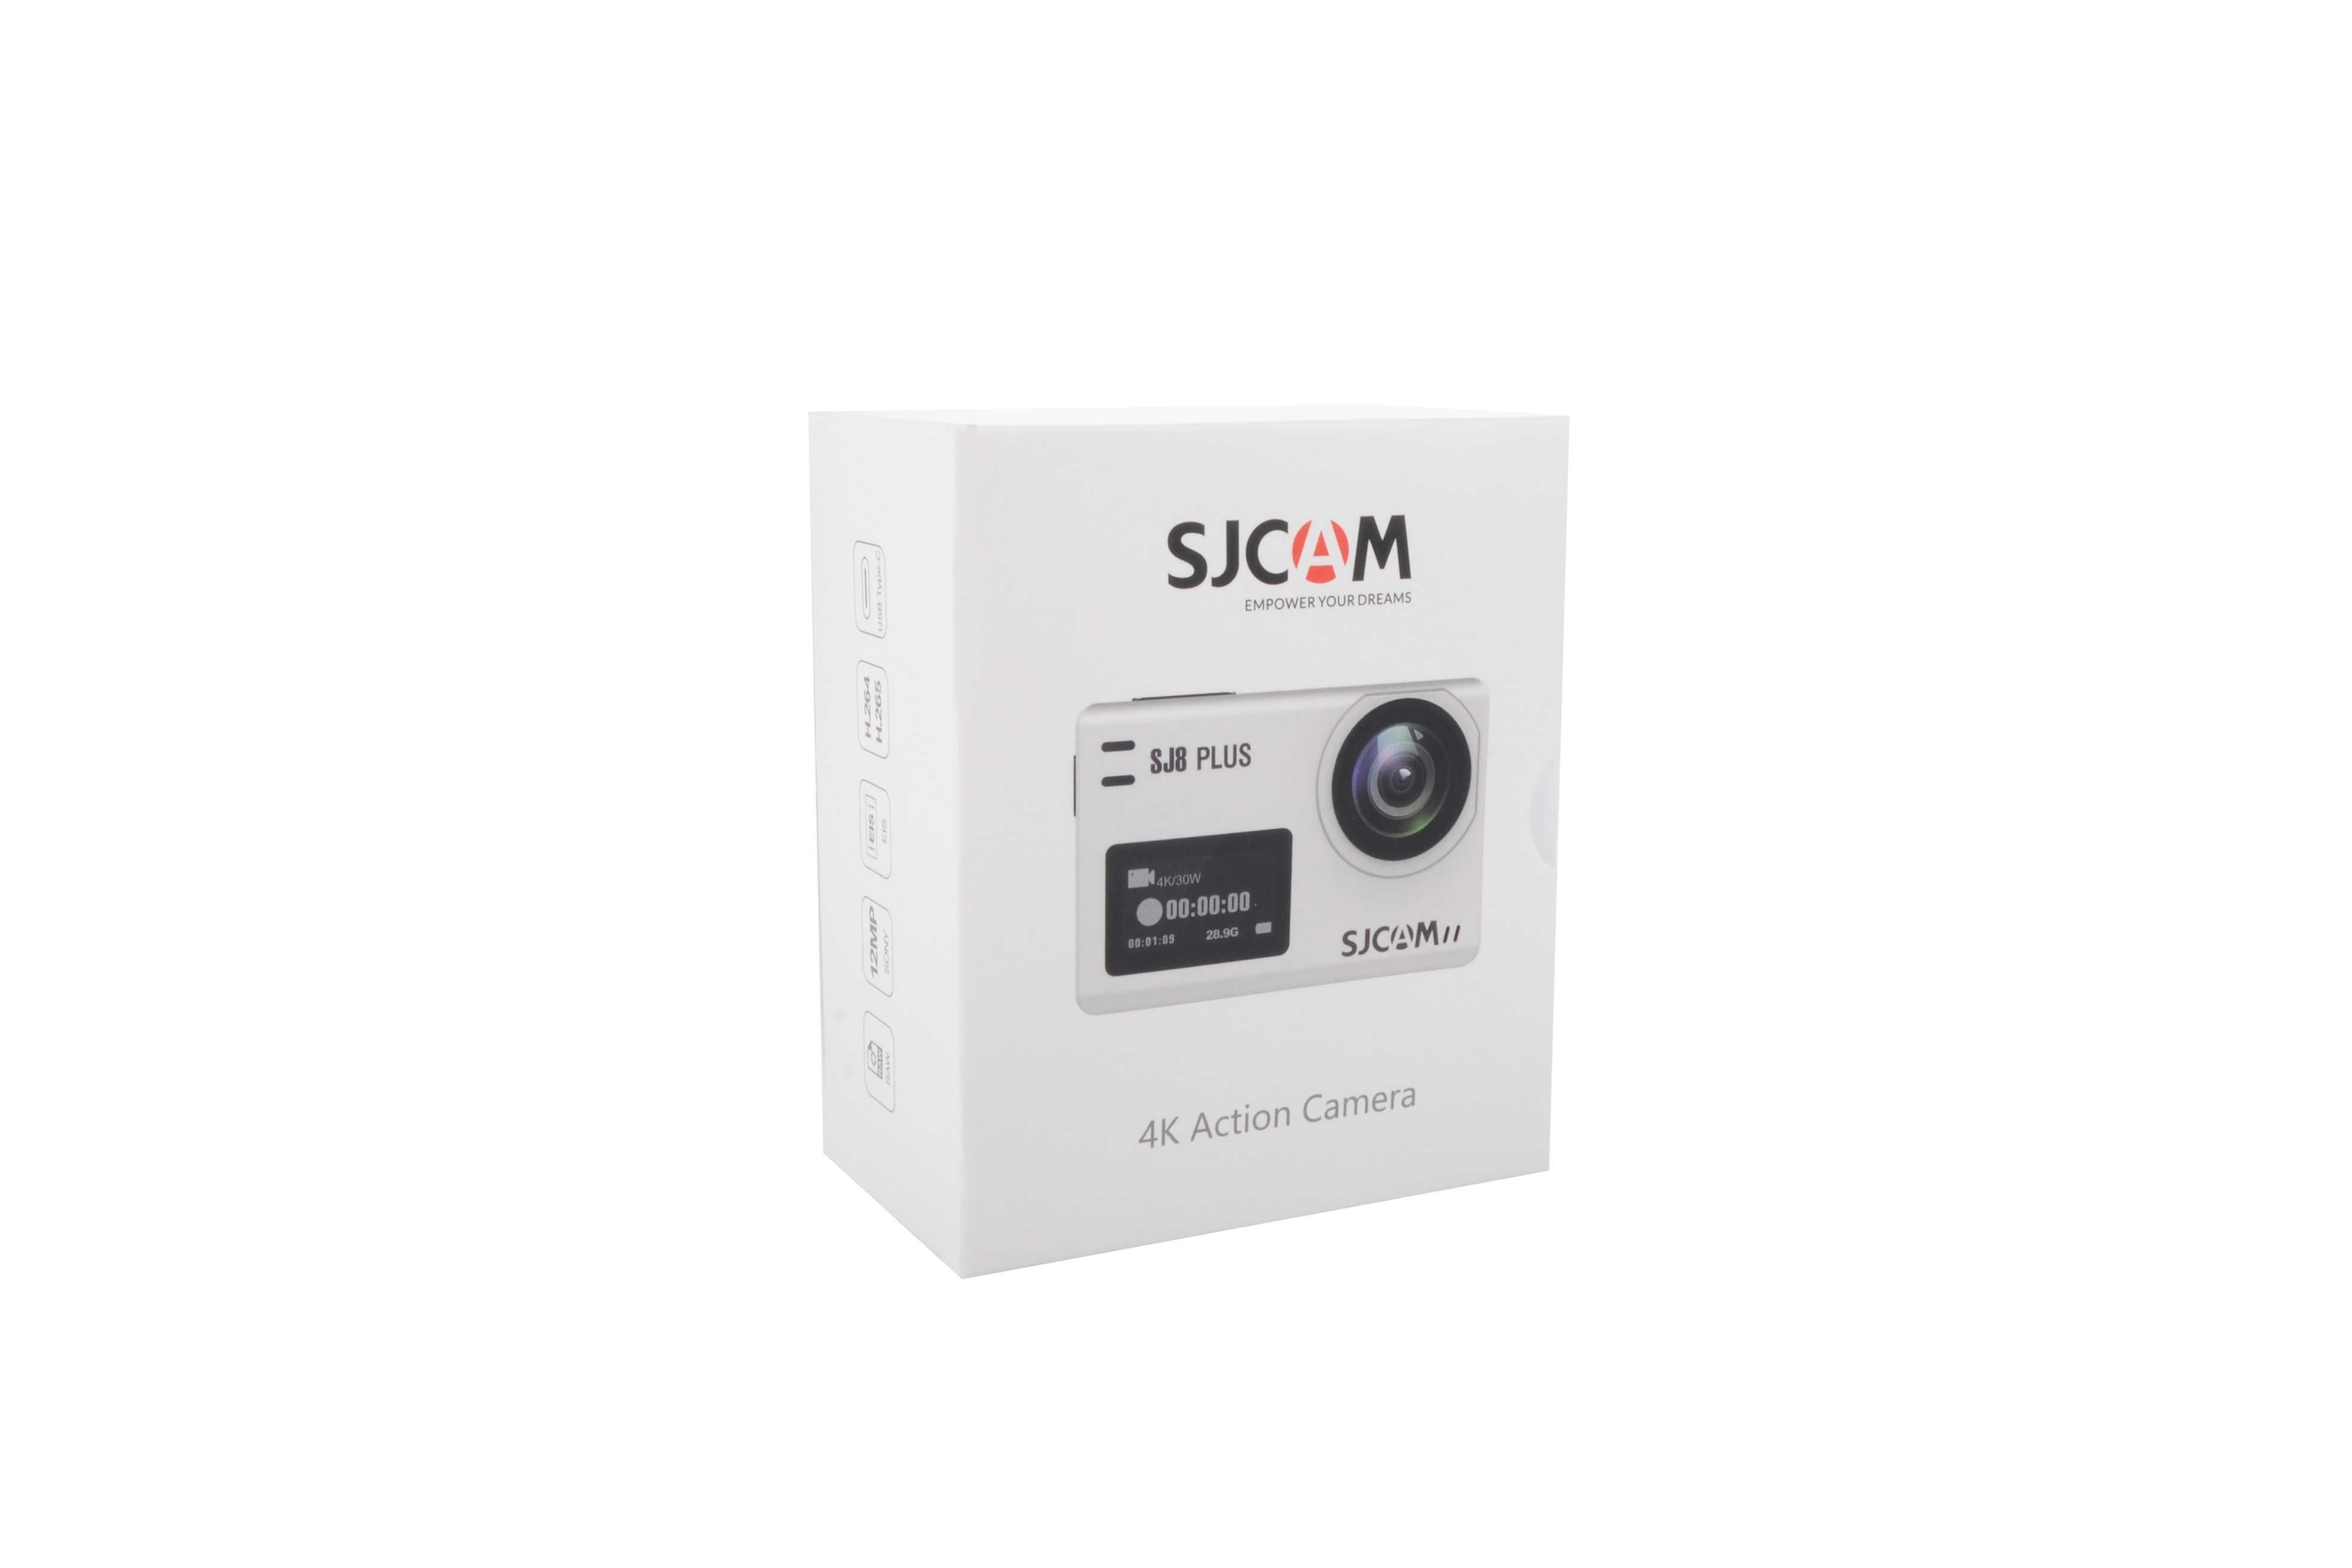 SJCAM SJ8 Pro/SJ8 Plus/SJ8 Udara WiFi Helmet Olahraga Aksi Kamera DV-Presale (Kotak Ritel termasuk Sederhana Aksesoris kecil)